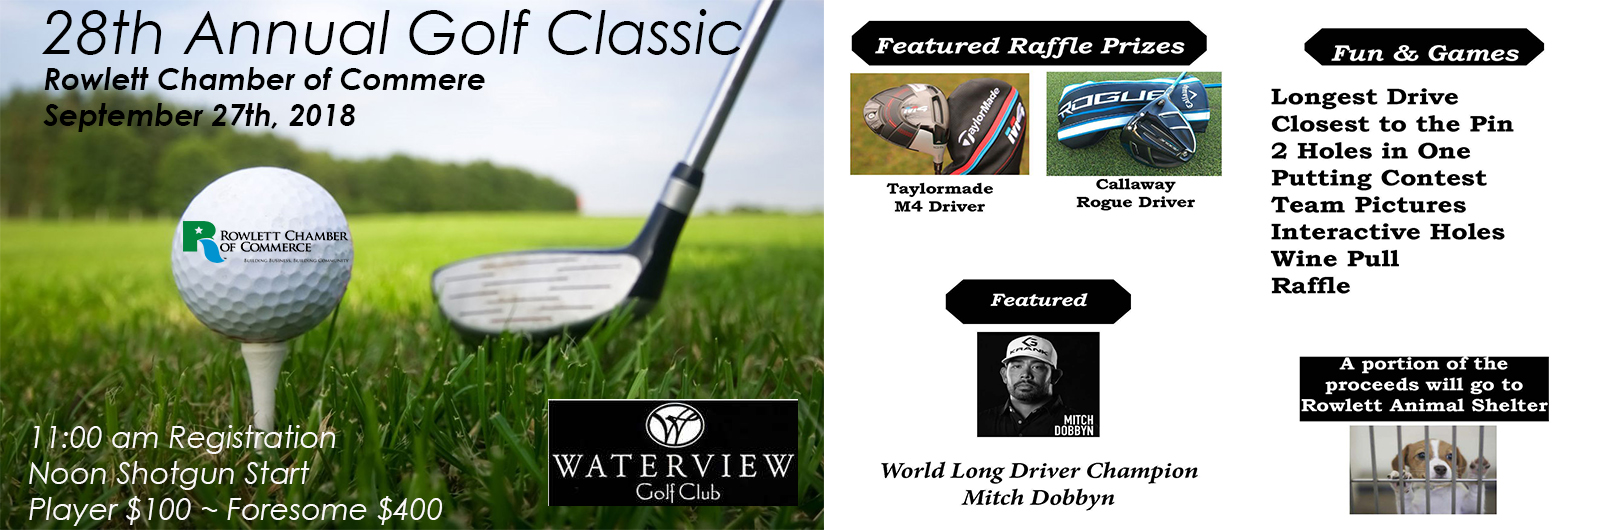 28th-Annual-Golf-Classic-website-slider.jpg